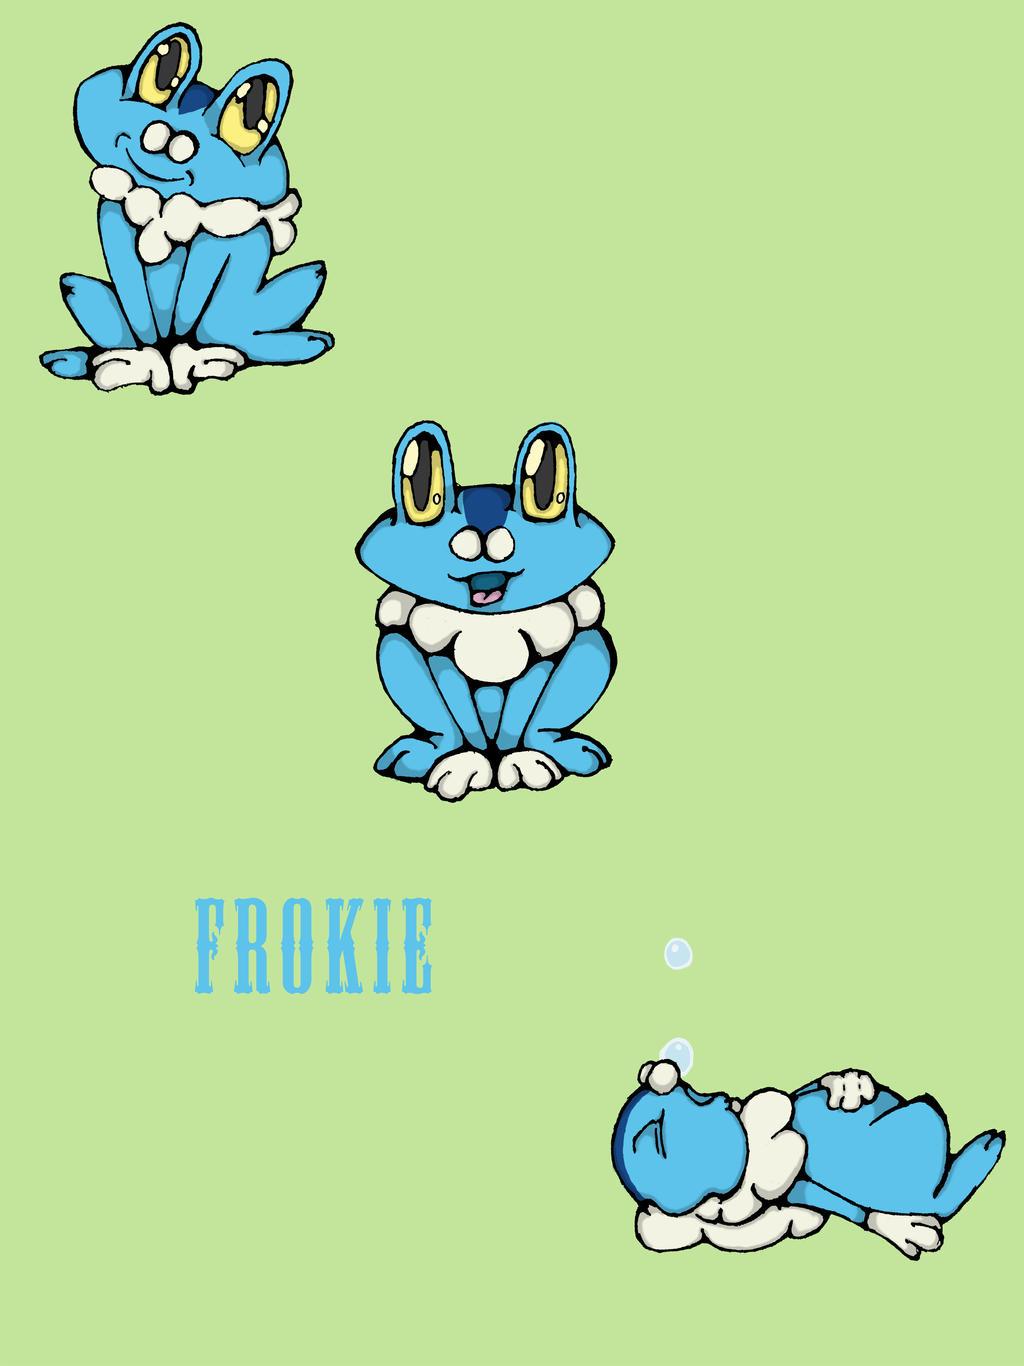 Frokie by Jazwind